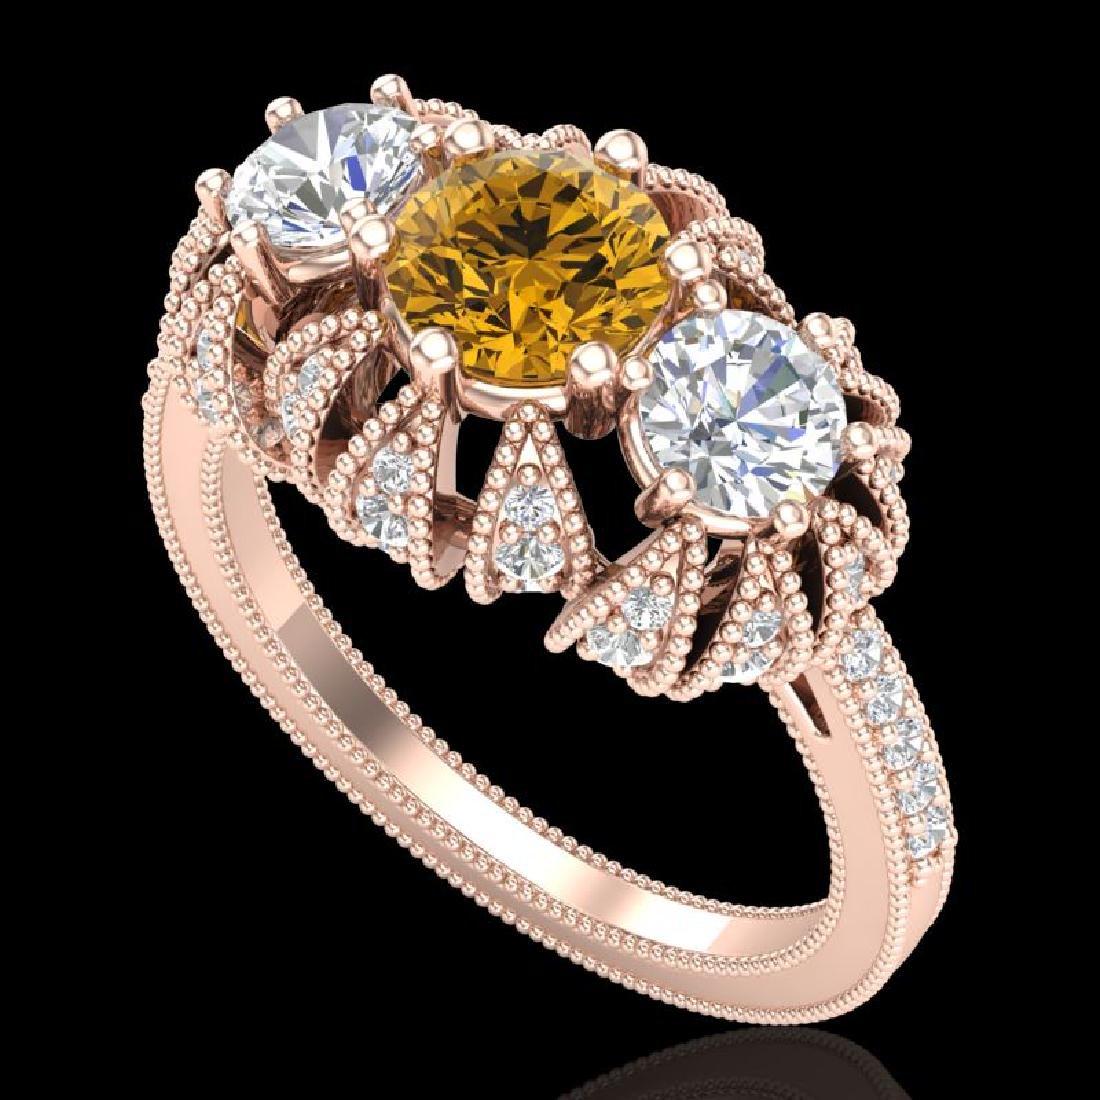 2.26 CTW Intense Fancy Yellow Diamond Art Deco 3 Stone